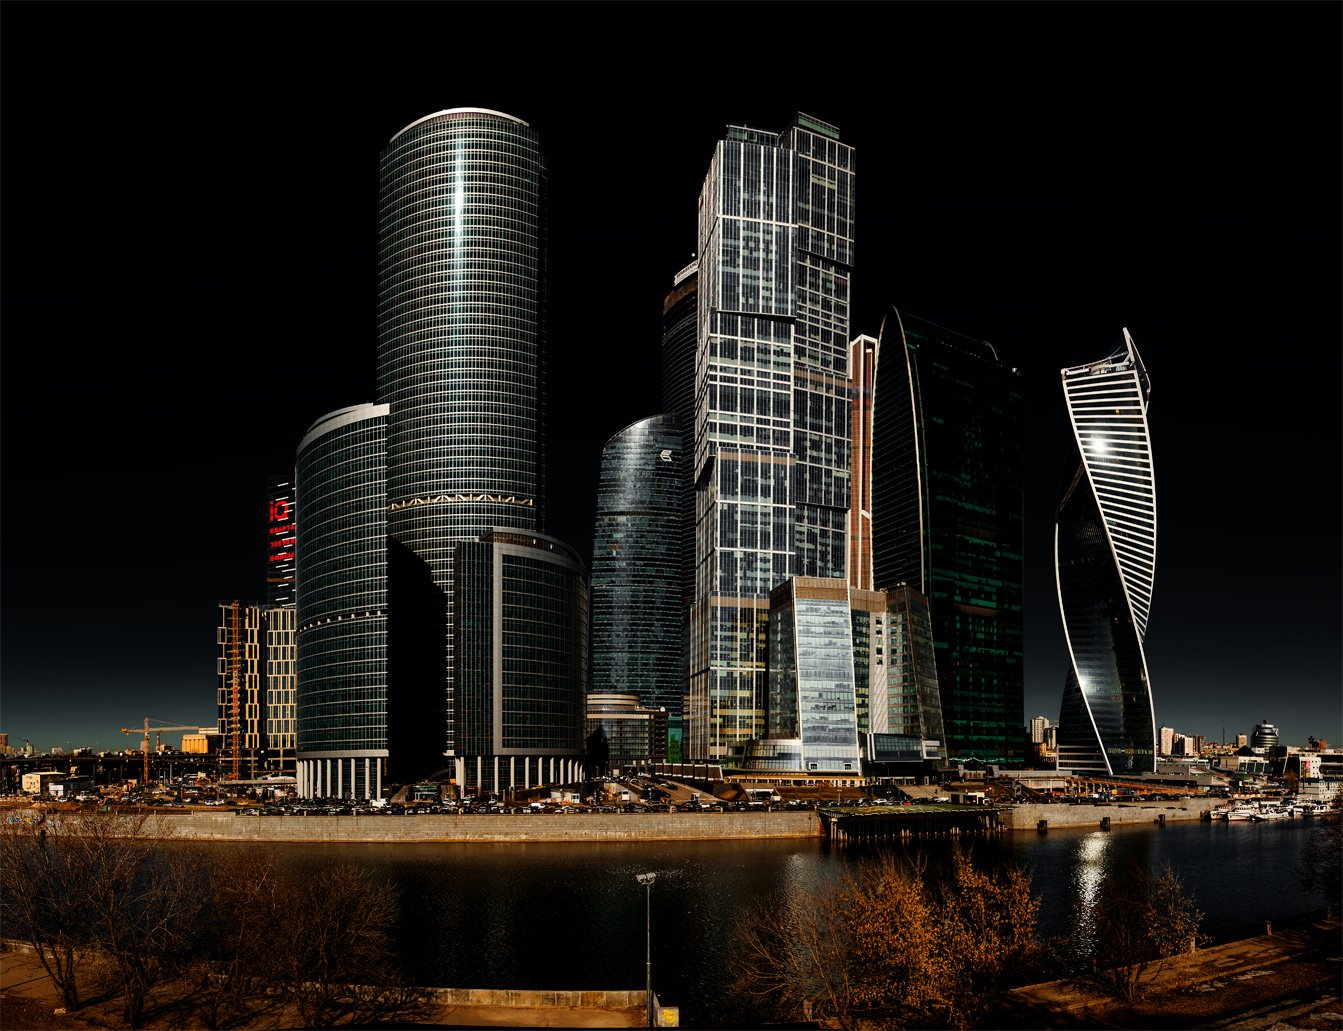 архитектура, город, москва, москва-река, москва-сити, ночь, пейзаж, Альберт Беляев